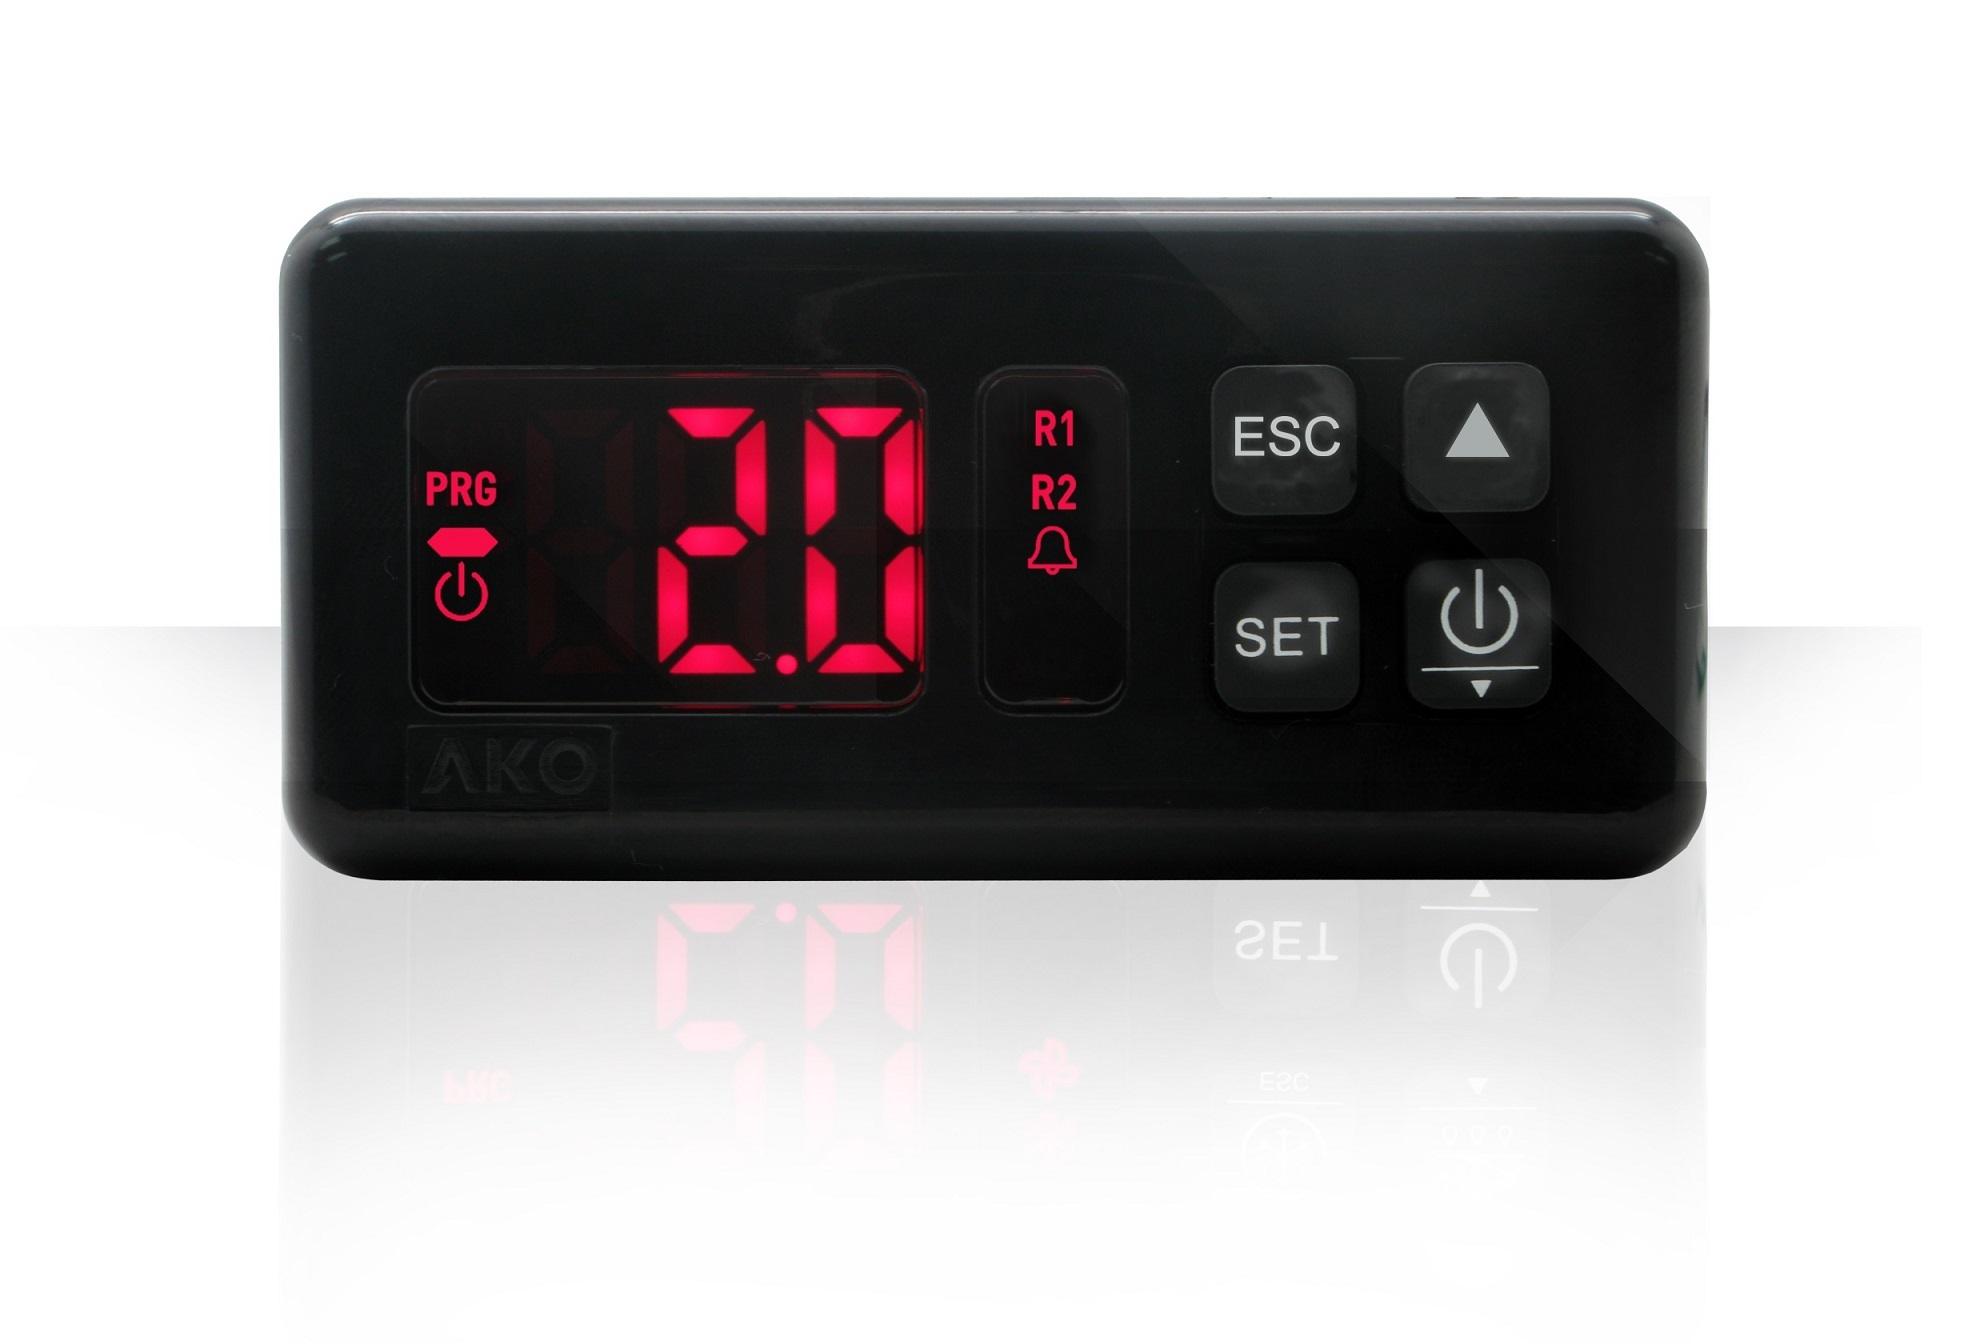 AKOCONTROL-controlador-temperatura-panelable